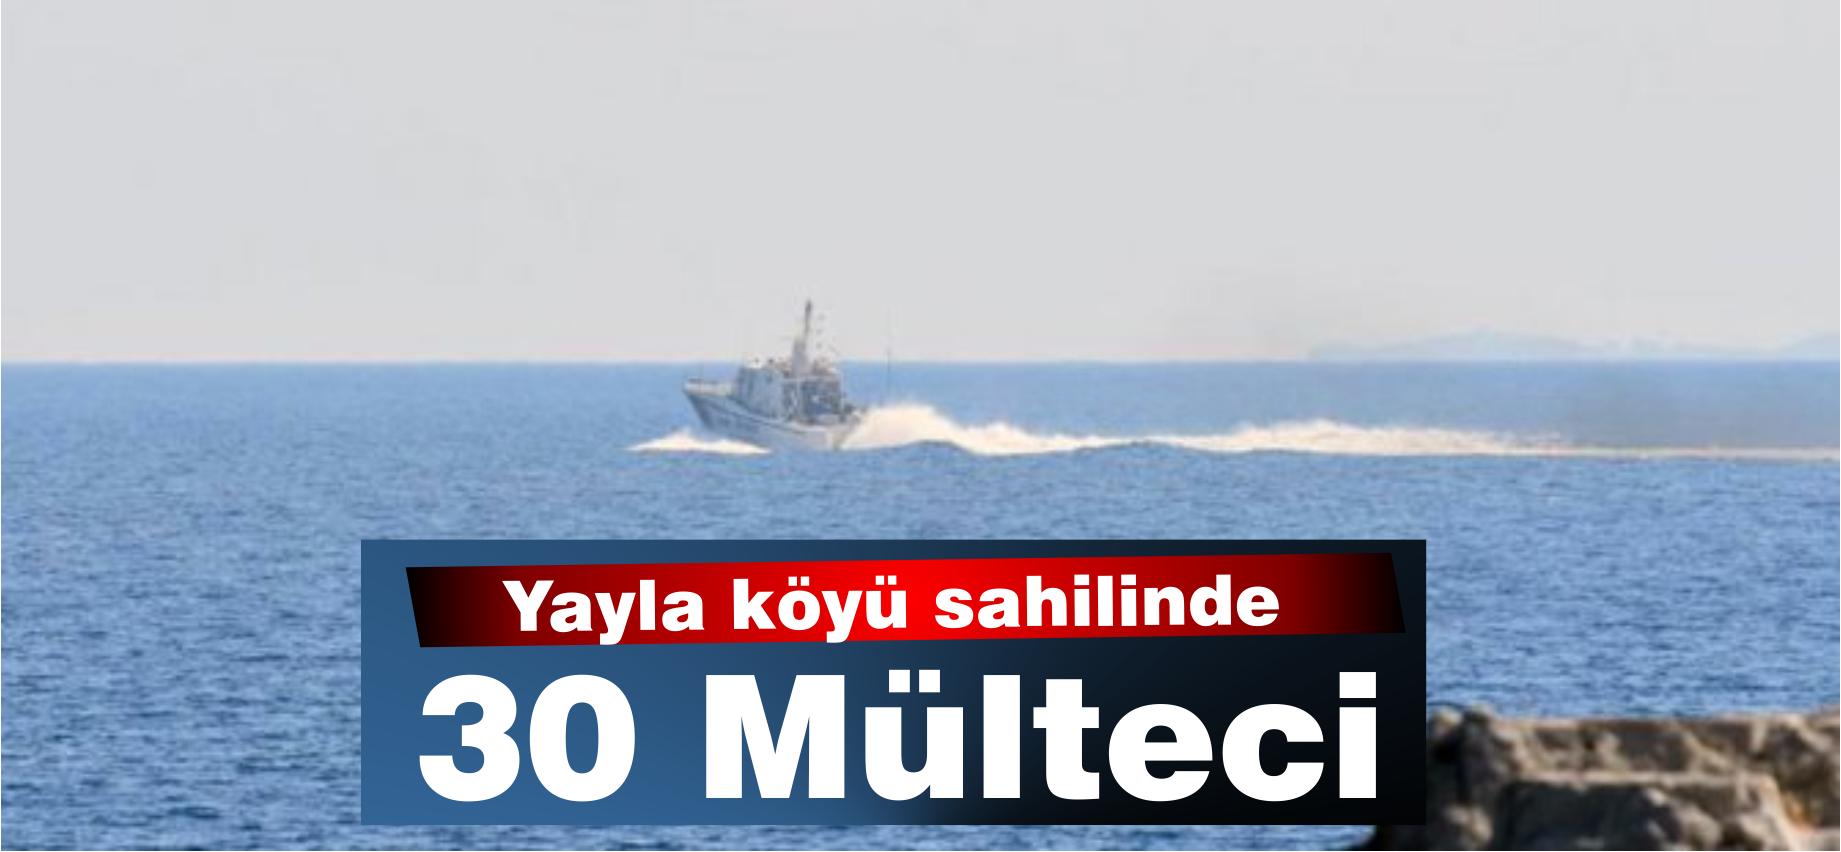 Yayla köyü sahilinde 30 mülteci!